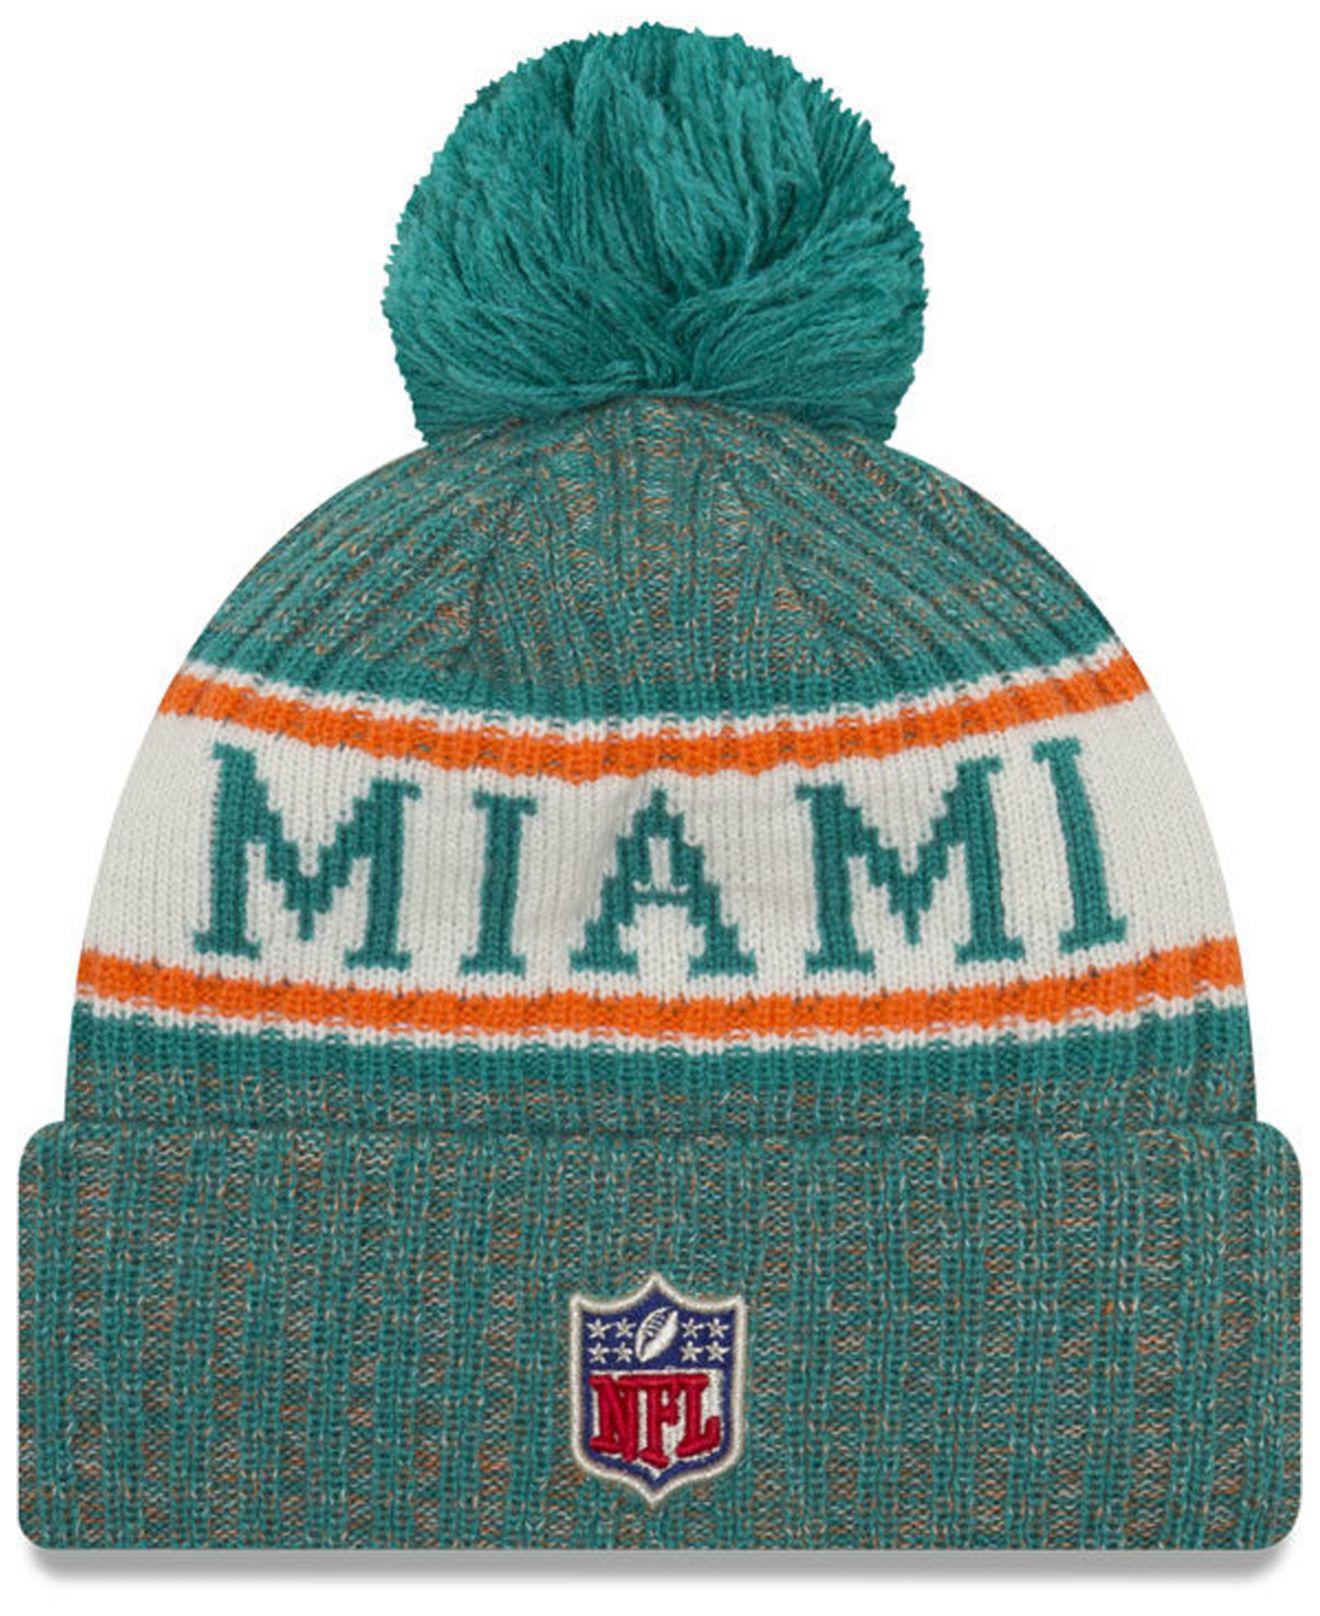 94a9c5a60eff3 ... italy lyst ktz miami dolphins sport knit hat 4d5dd 244a0